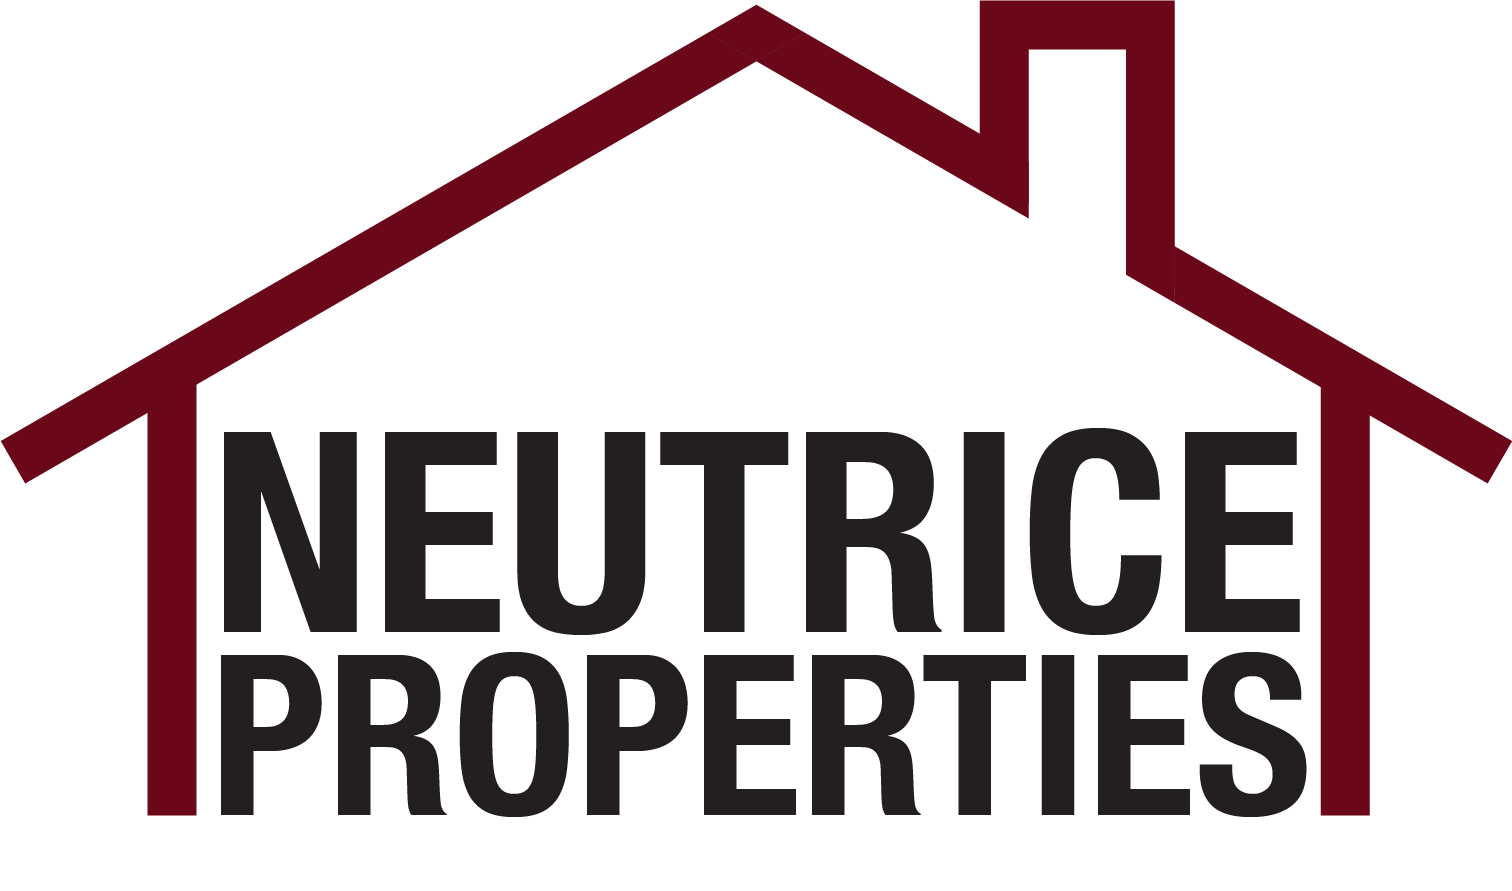 Neutrice Properties, LLC  logo